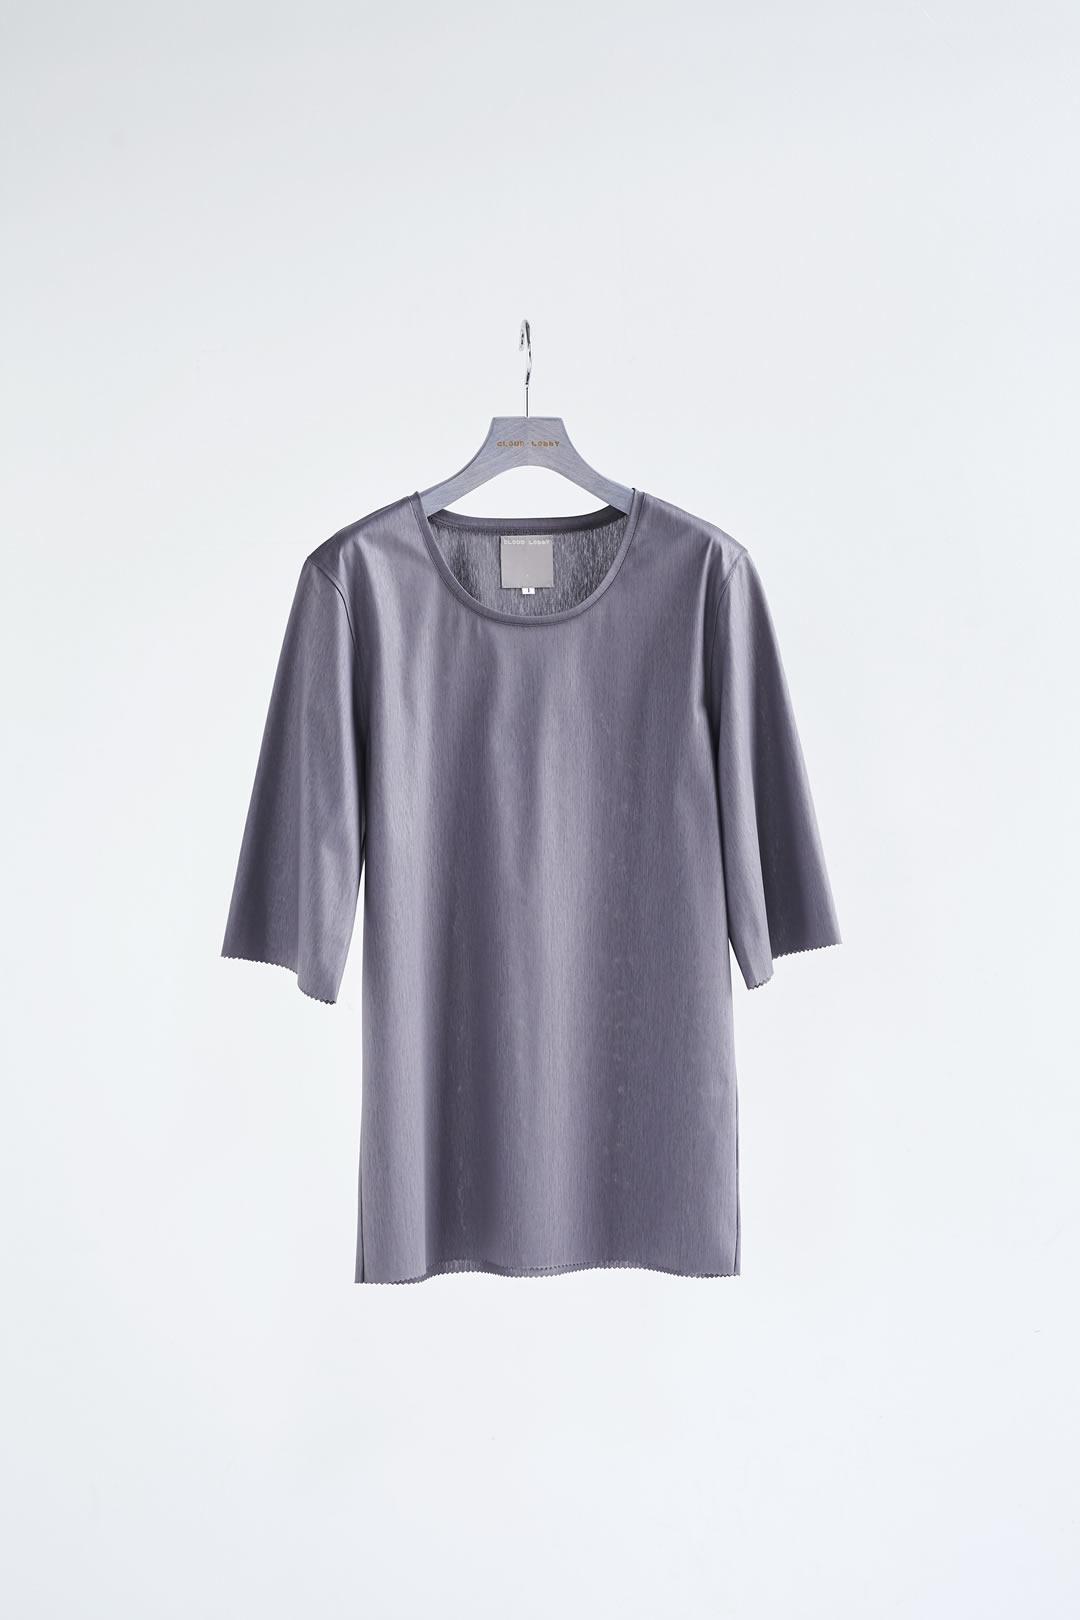 model.10 grey